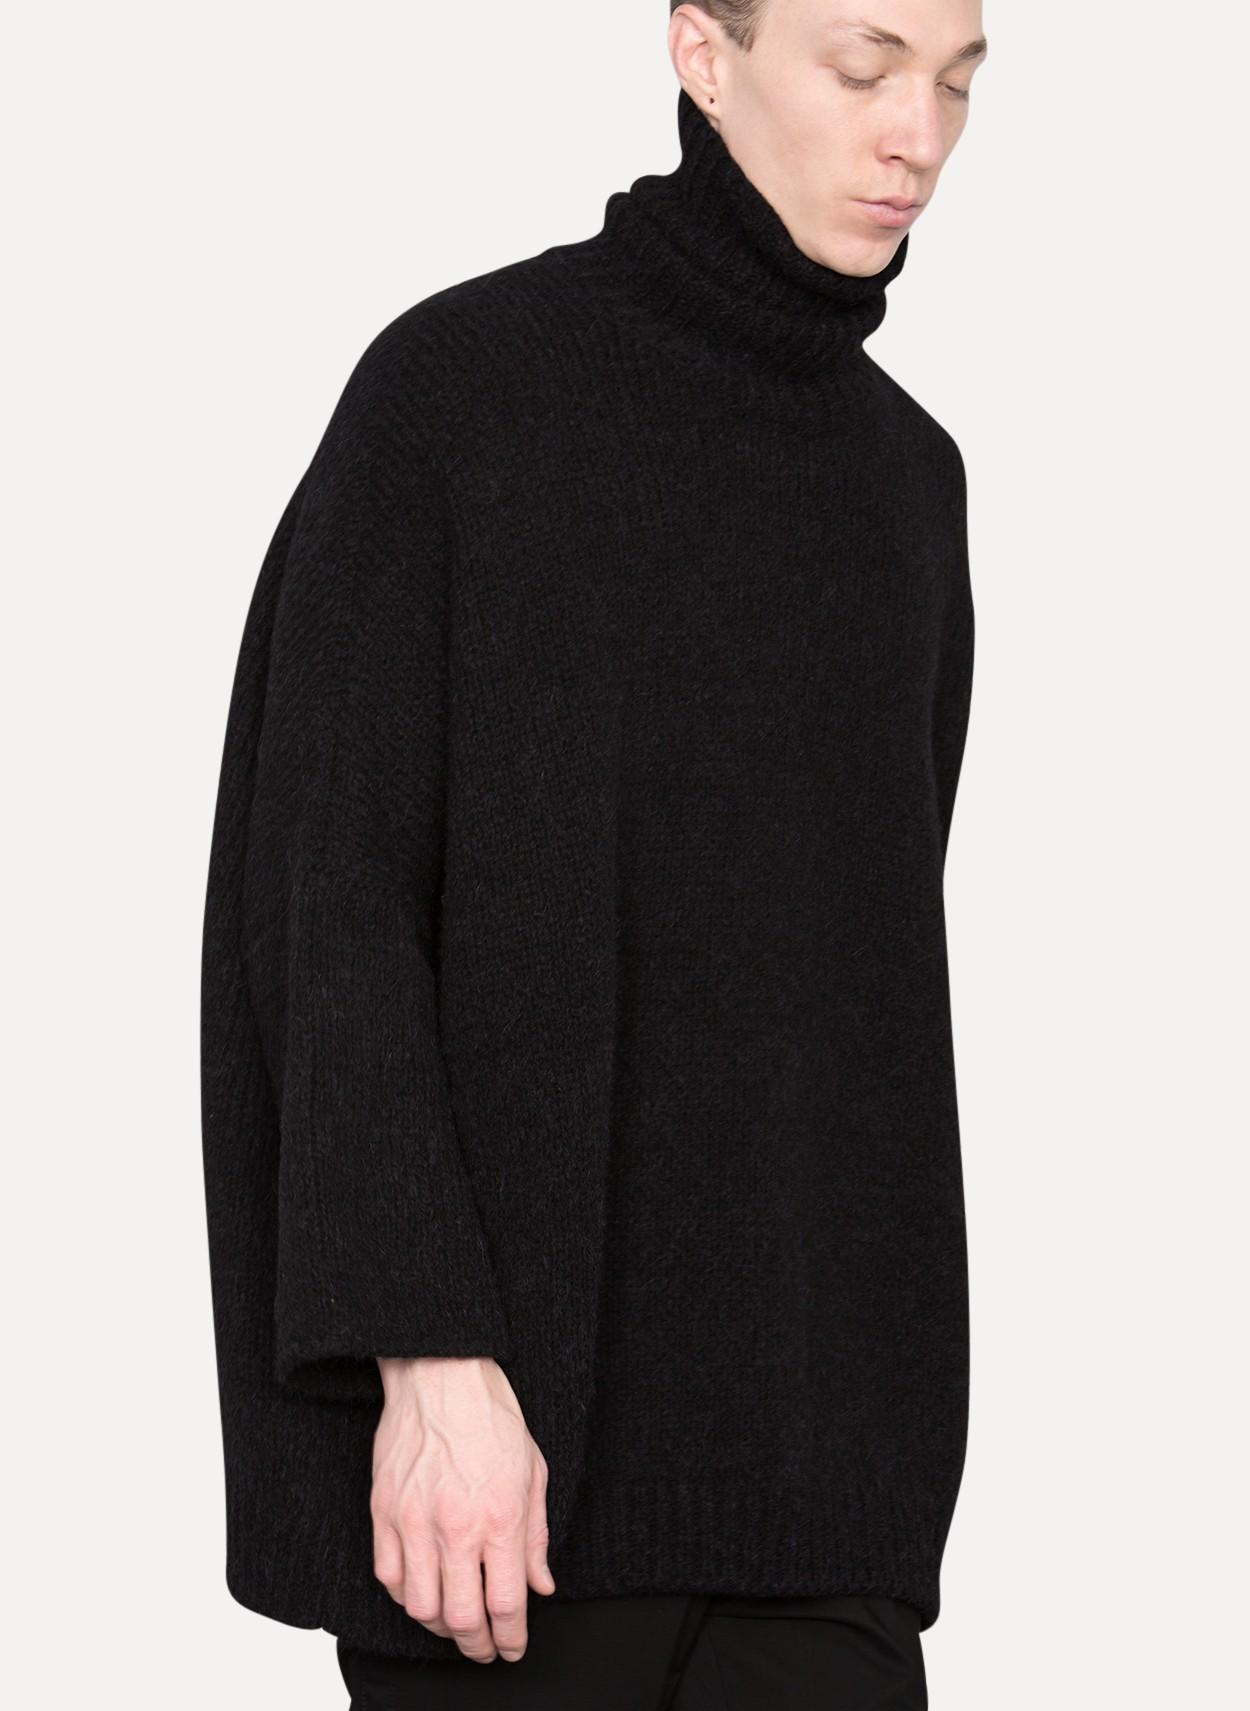 Thamanyah Unisex Oversized Turtle Neck Sweater in Black for Men | Lyst